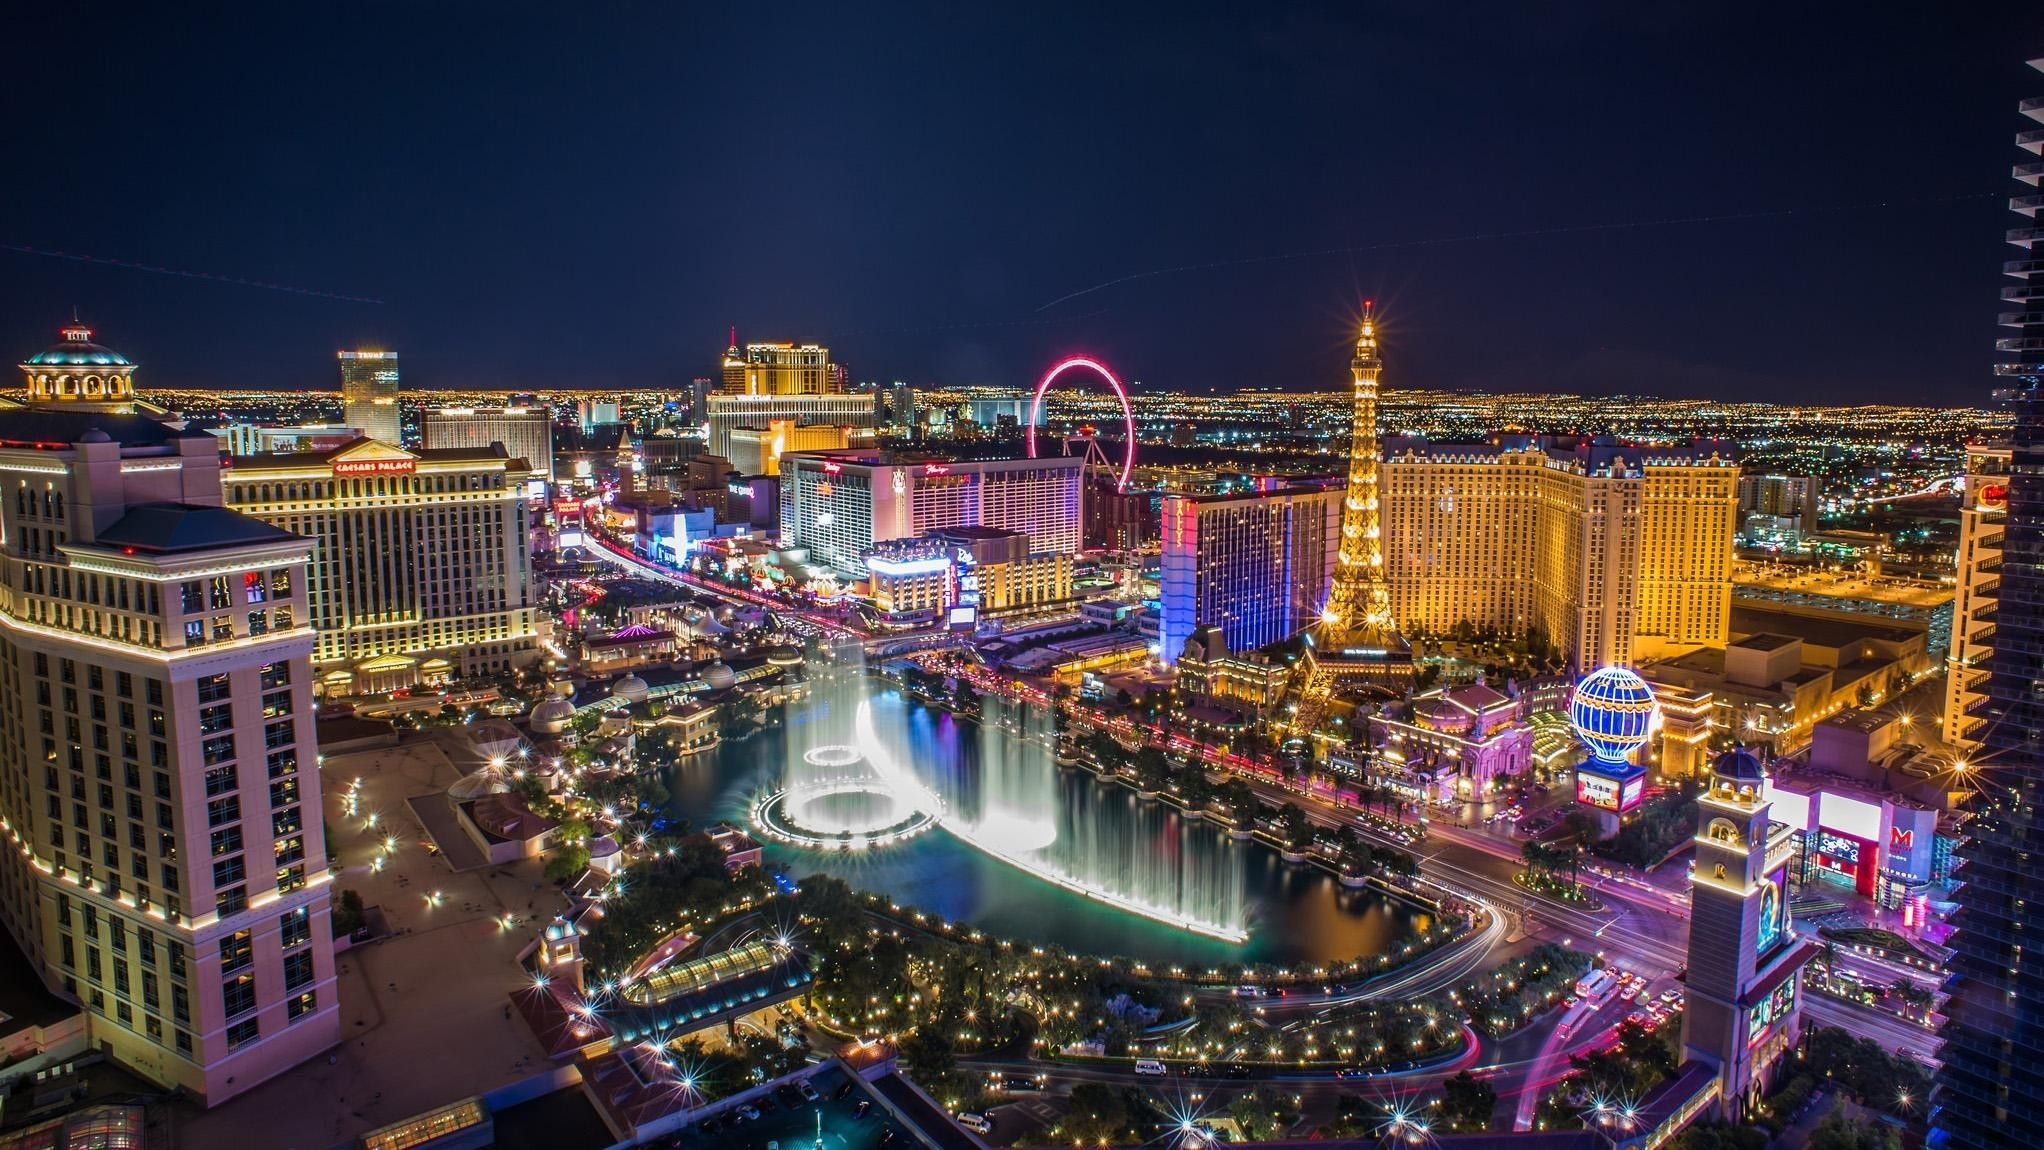 Las Vegas Desktop Wallpaper 60 images 2044x1150